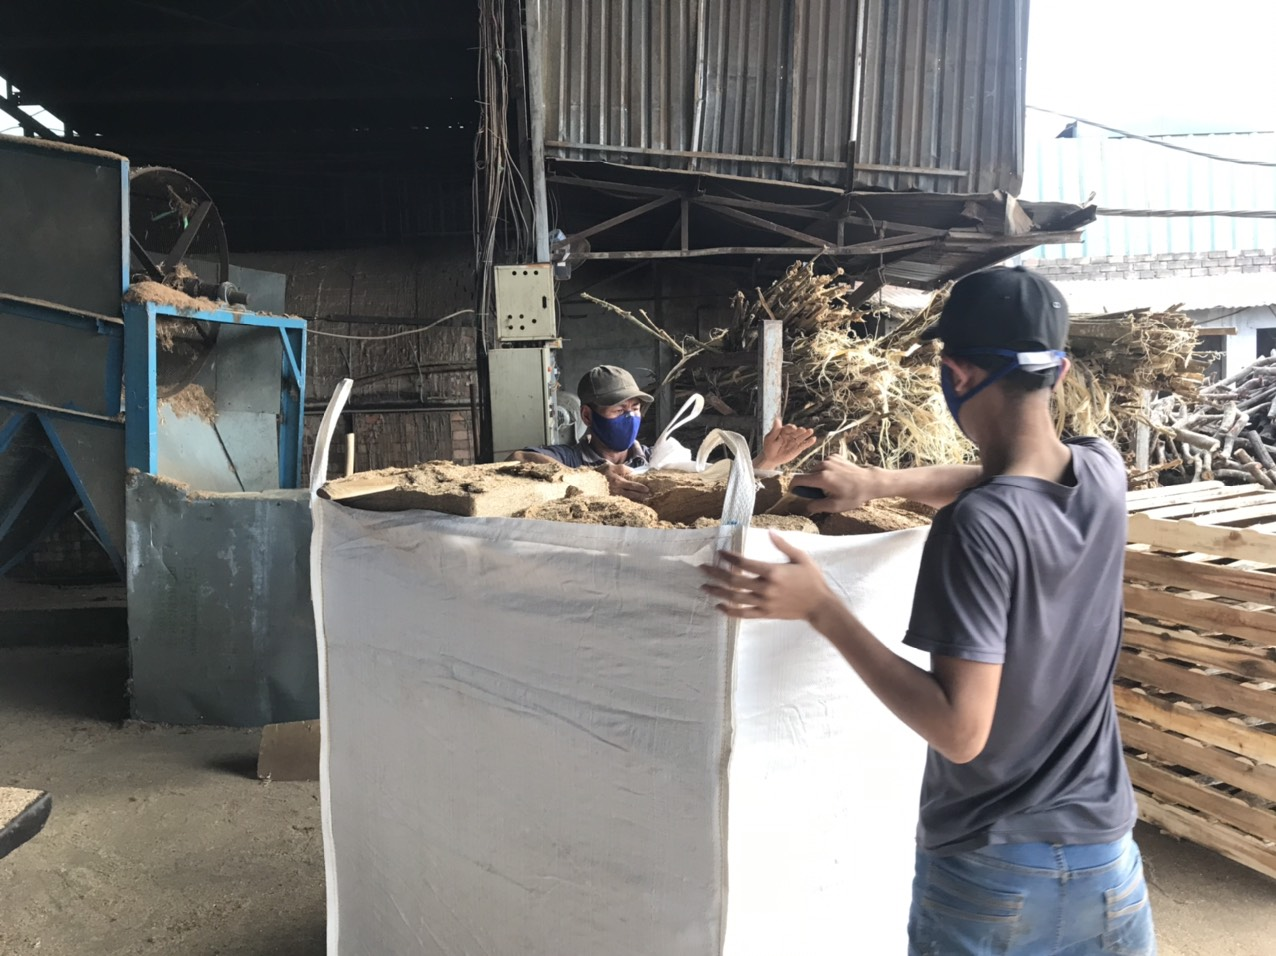 wood-sawdust-factory-world-export